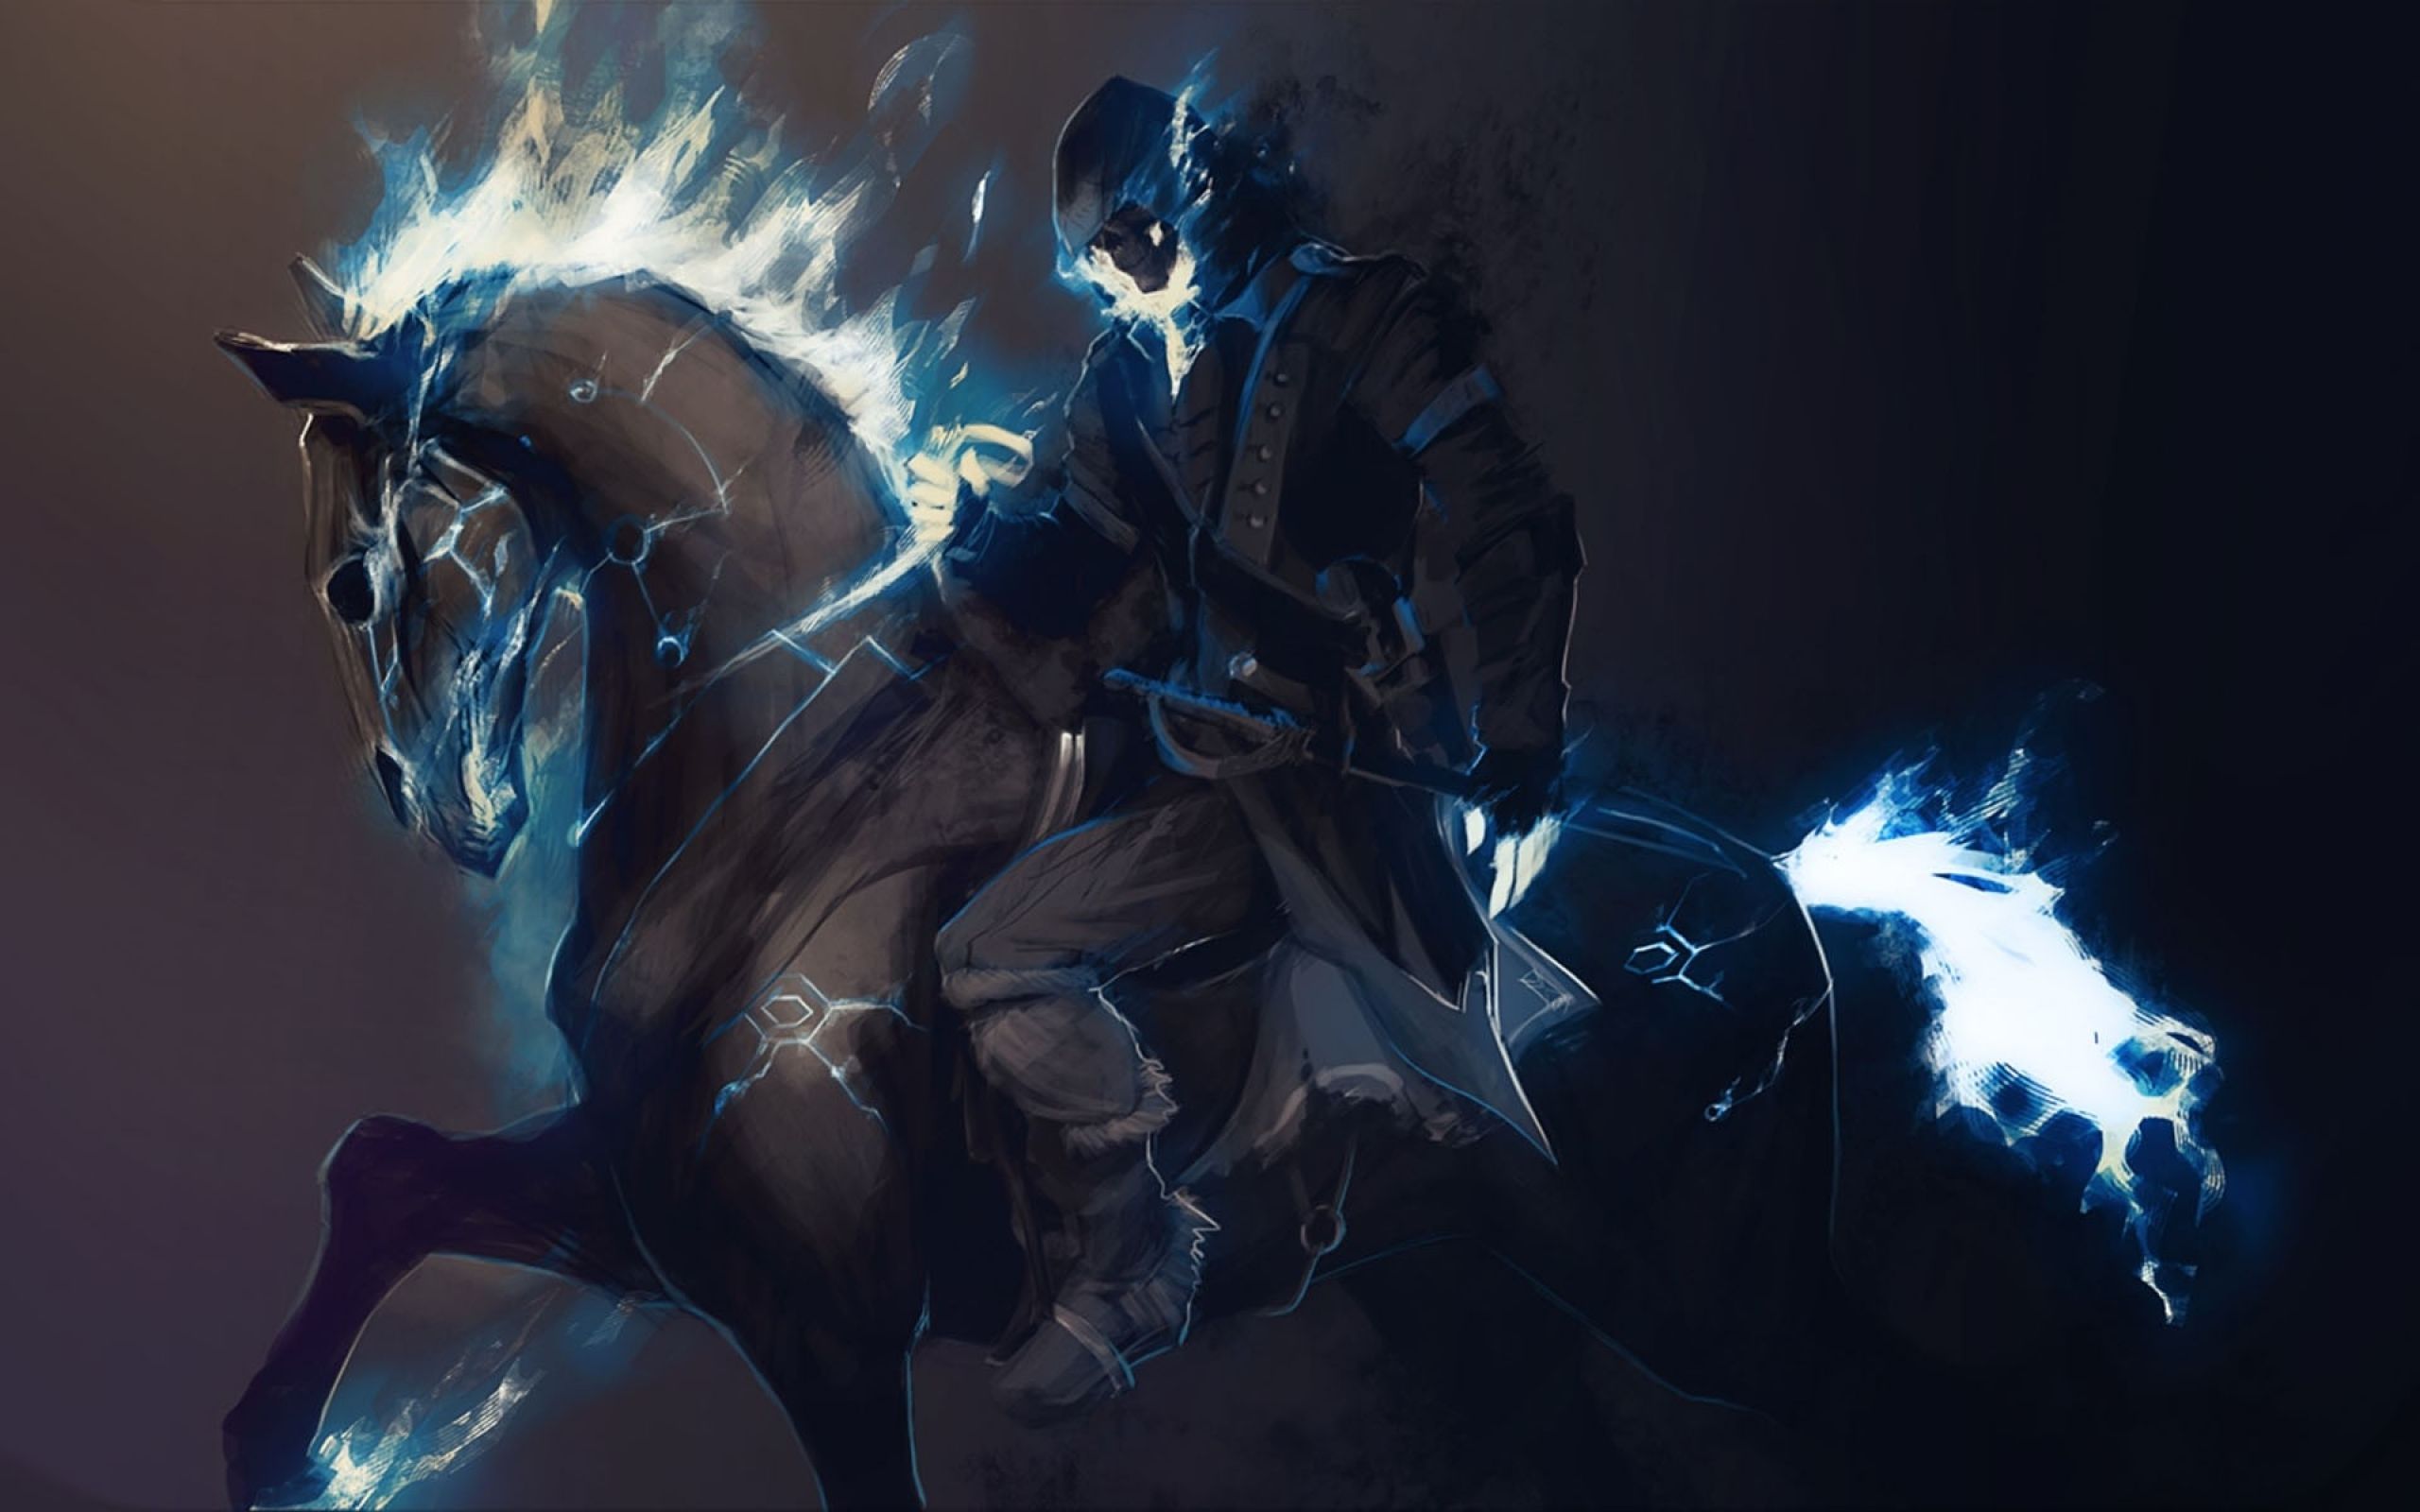 Beautiful Wallpaper Horse Ghost Rider - 7b0d837d380cda03c7eedbffe800d563  Pic_672210.jpg